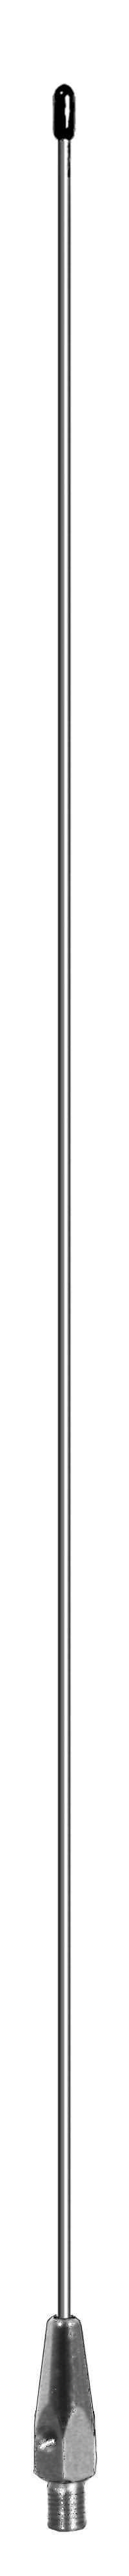 "102"" STEEL WHIP 3/8X24 THREAD CRIMP STYLE"